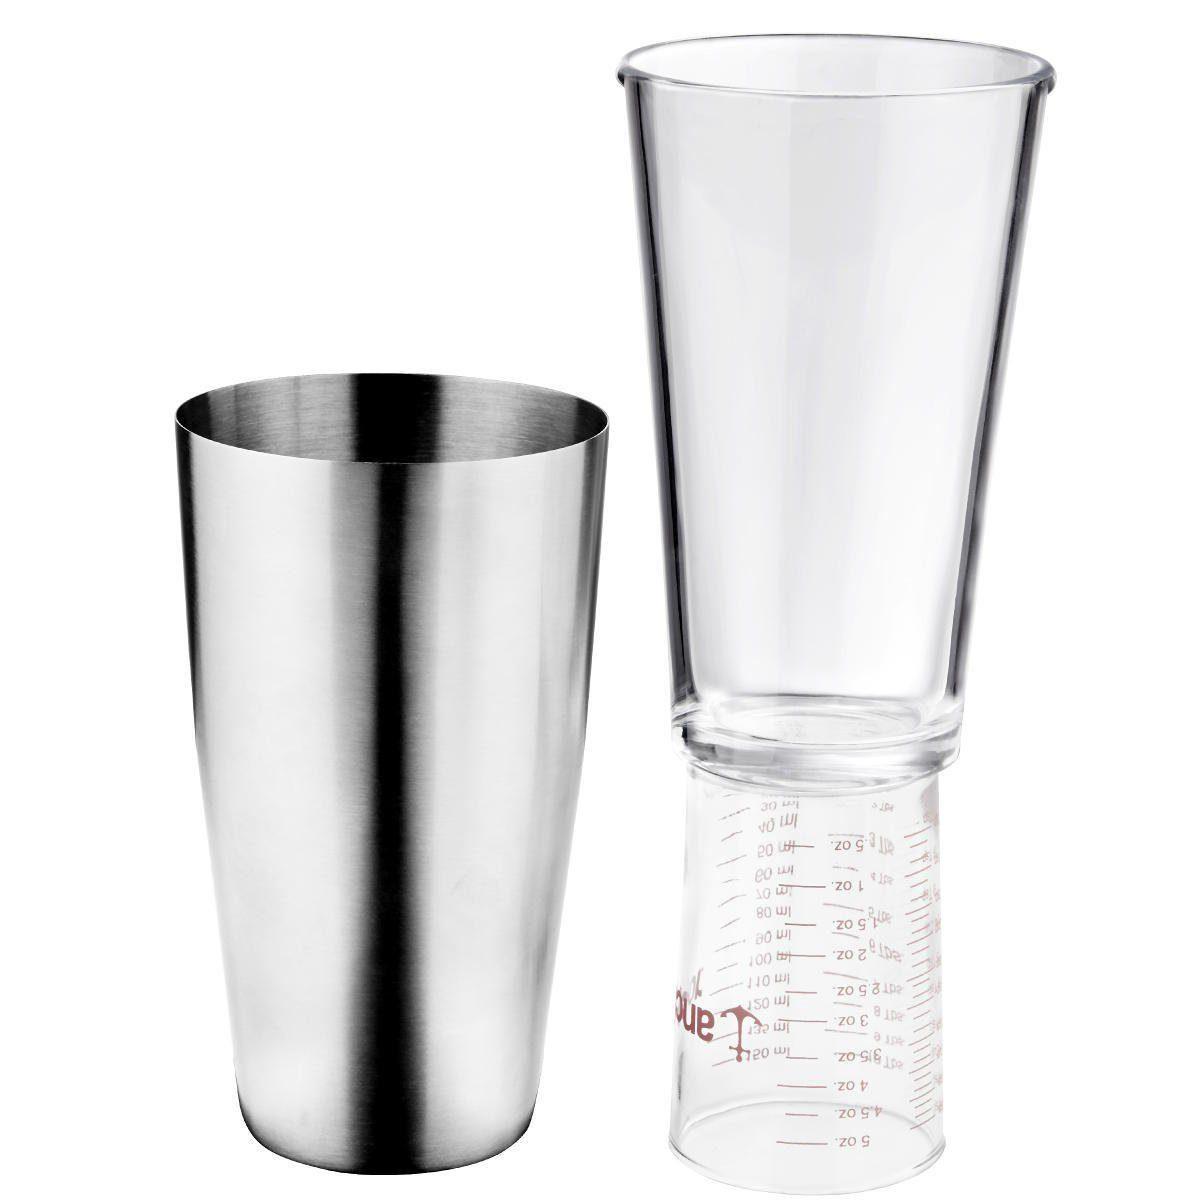 BUTLERS BOSTON SHAKER »Cocktailshaker mit Glas«